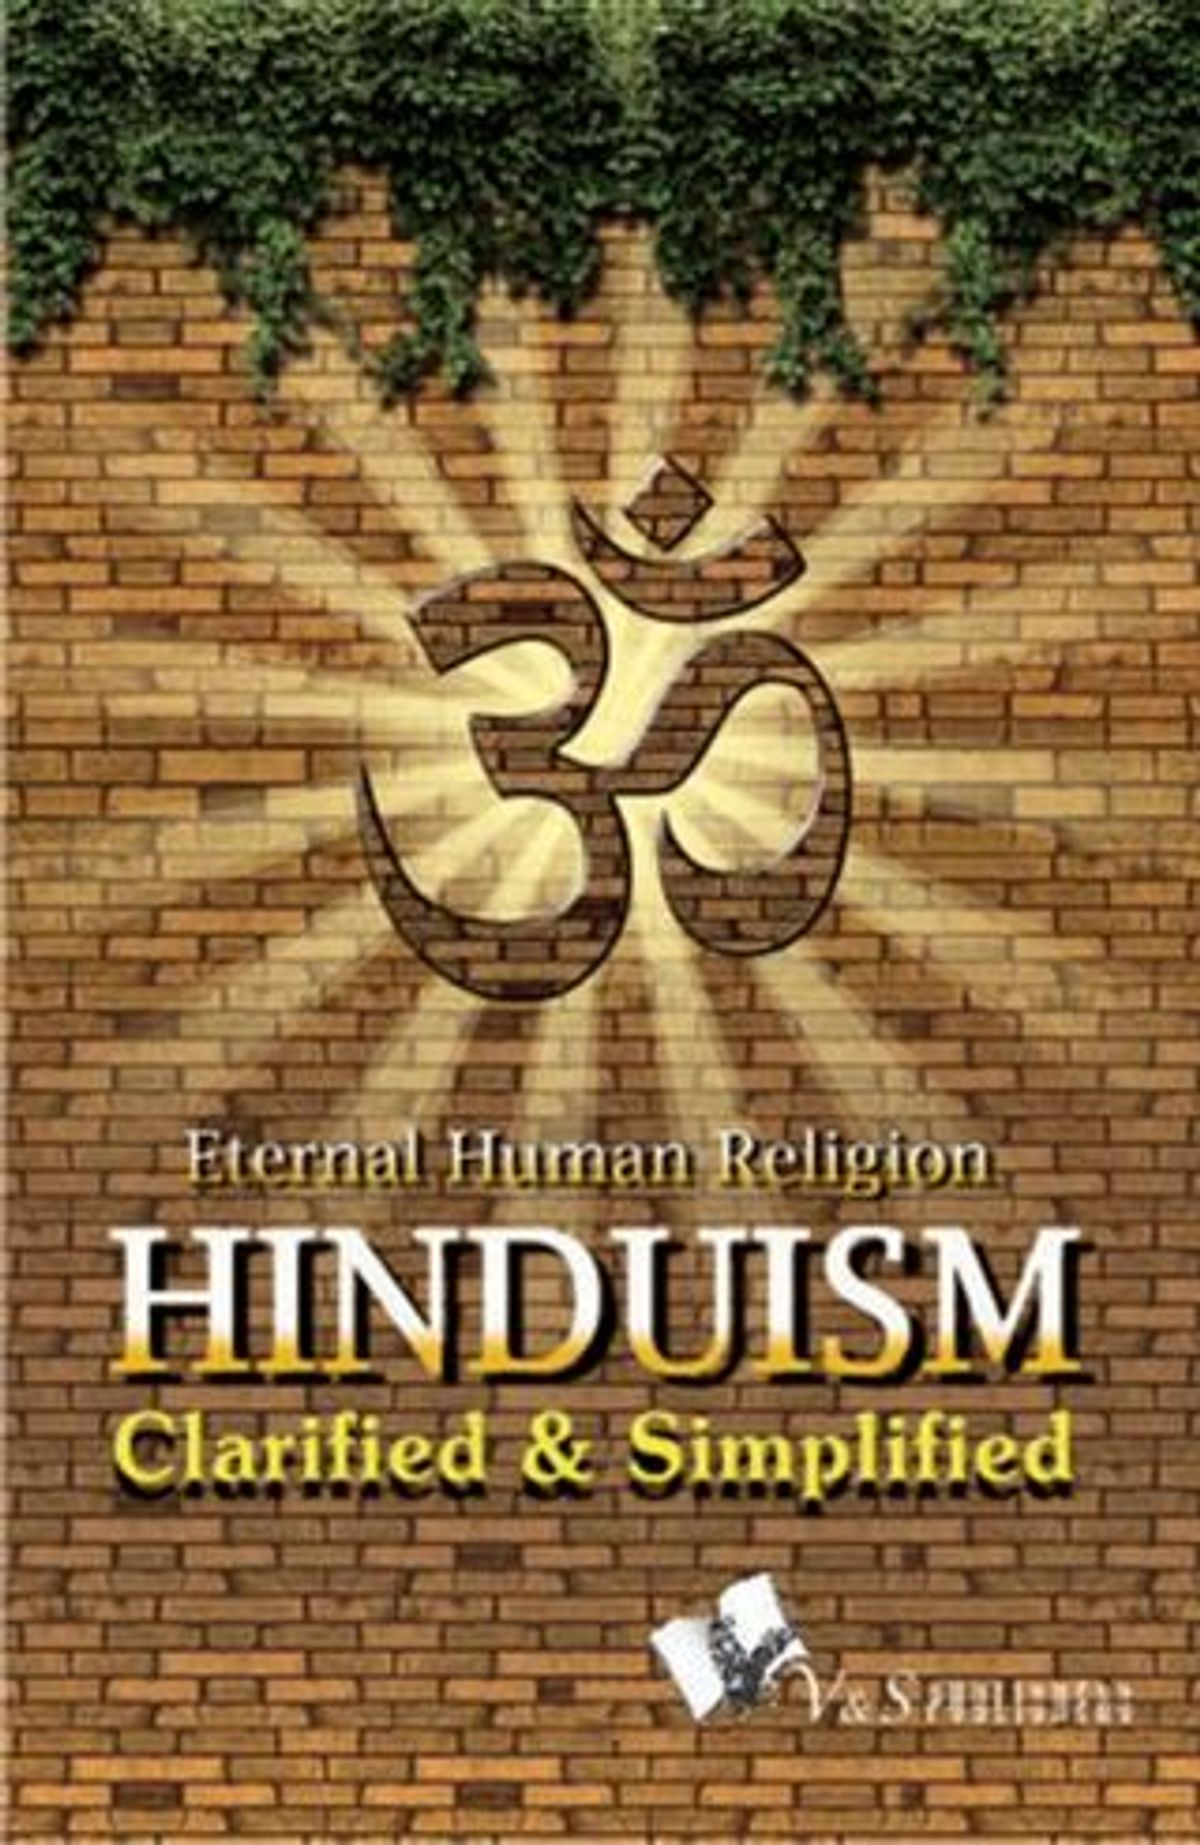 Hinduism: Clarified & Simplified